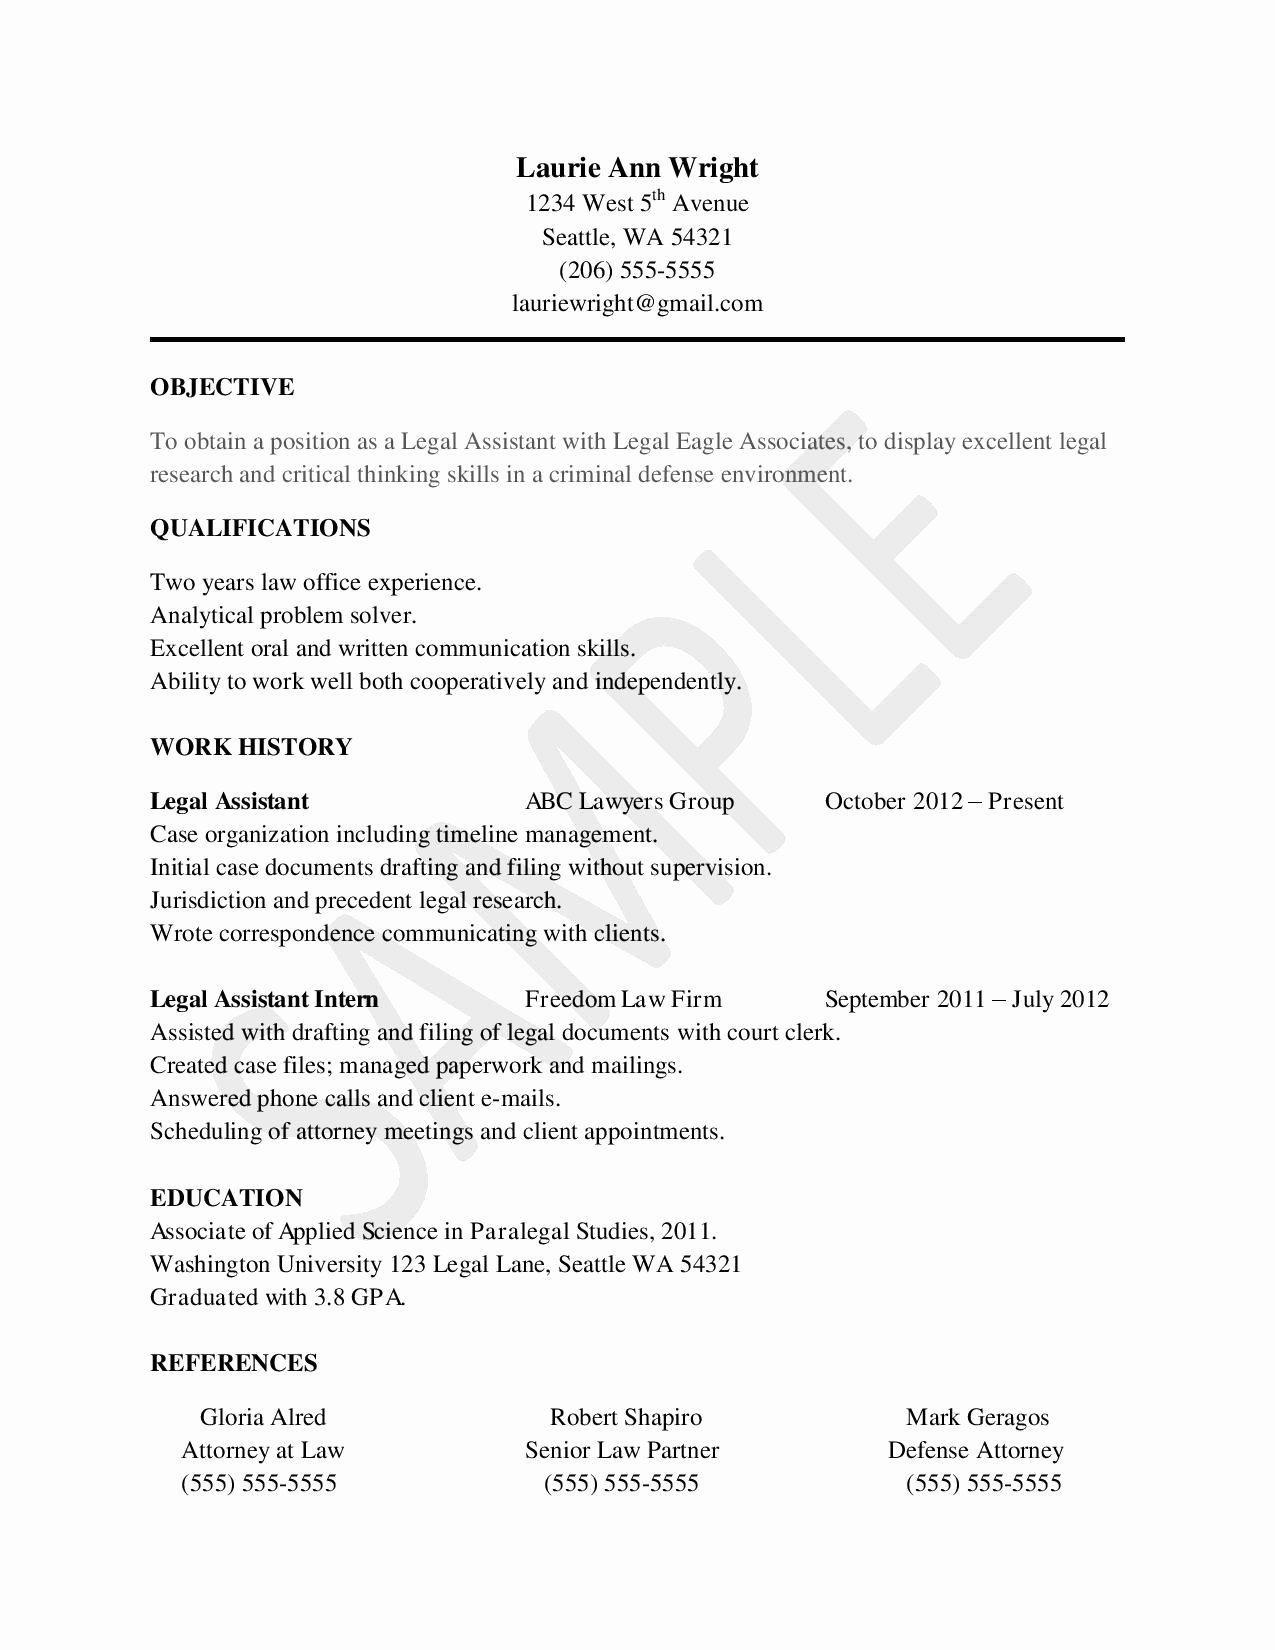 Entry Level Paralegal Resume New Sample Resume for Legal